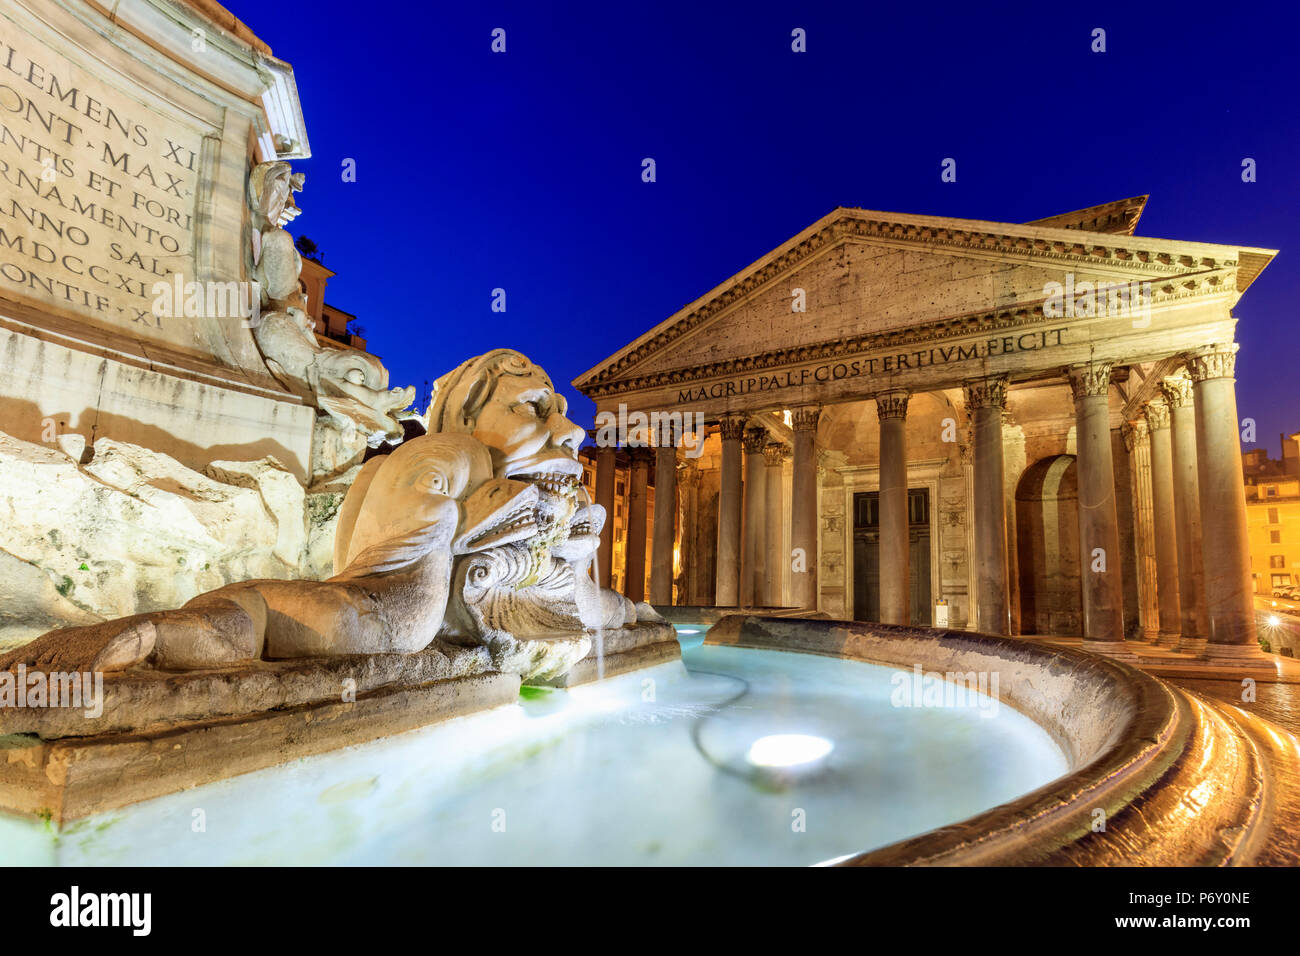 Italy, Rome, Pantheon and Piazza della Rotonda Fountain by night - Stock Image